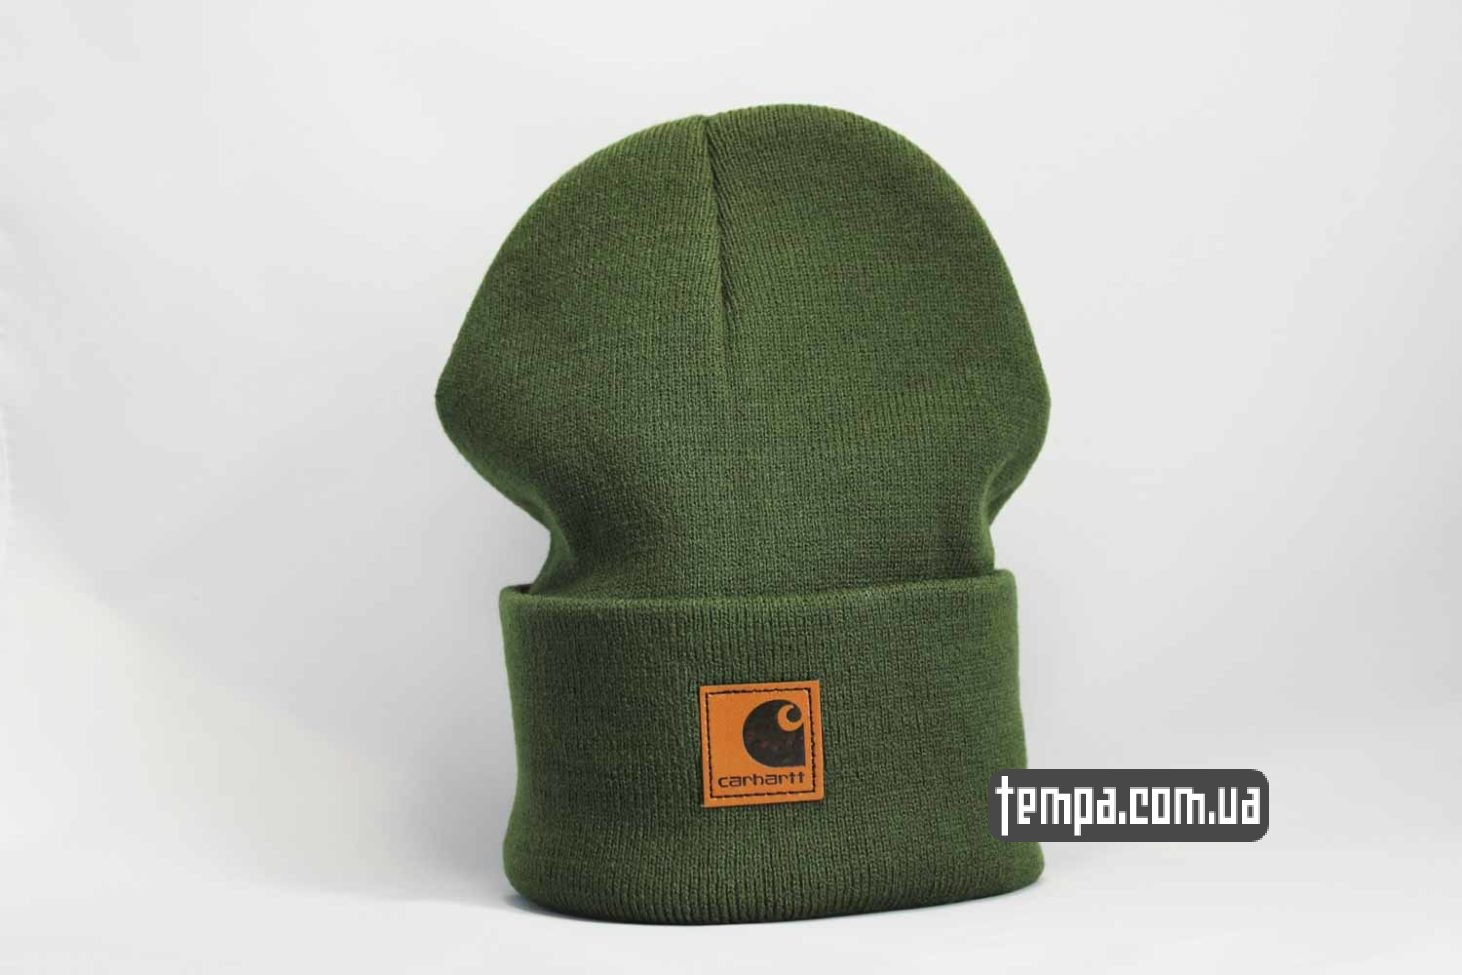 шапка beanie Carhartt кожаная зеленая с логотипом